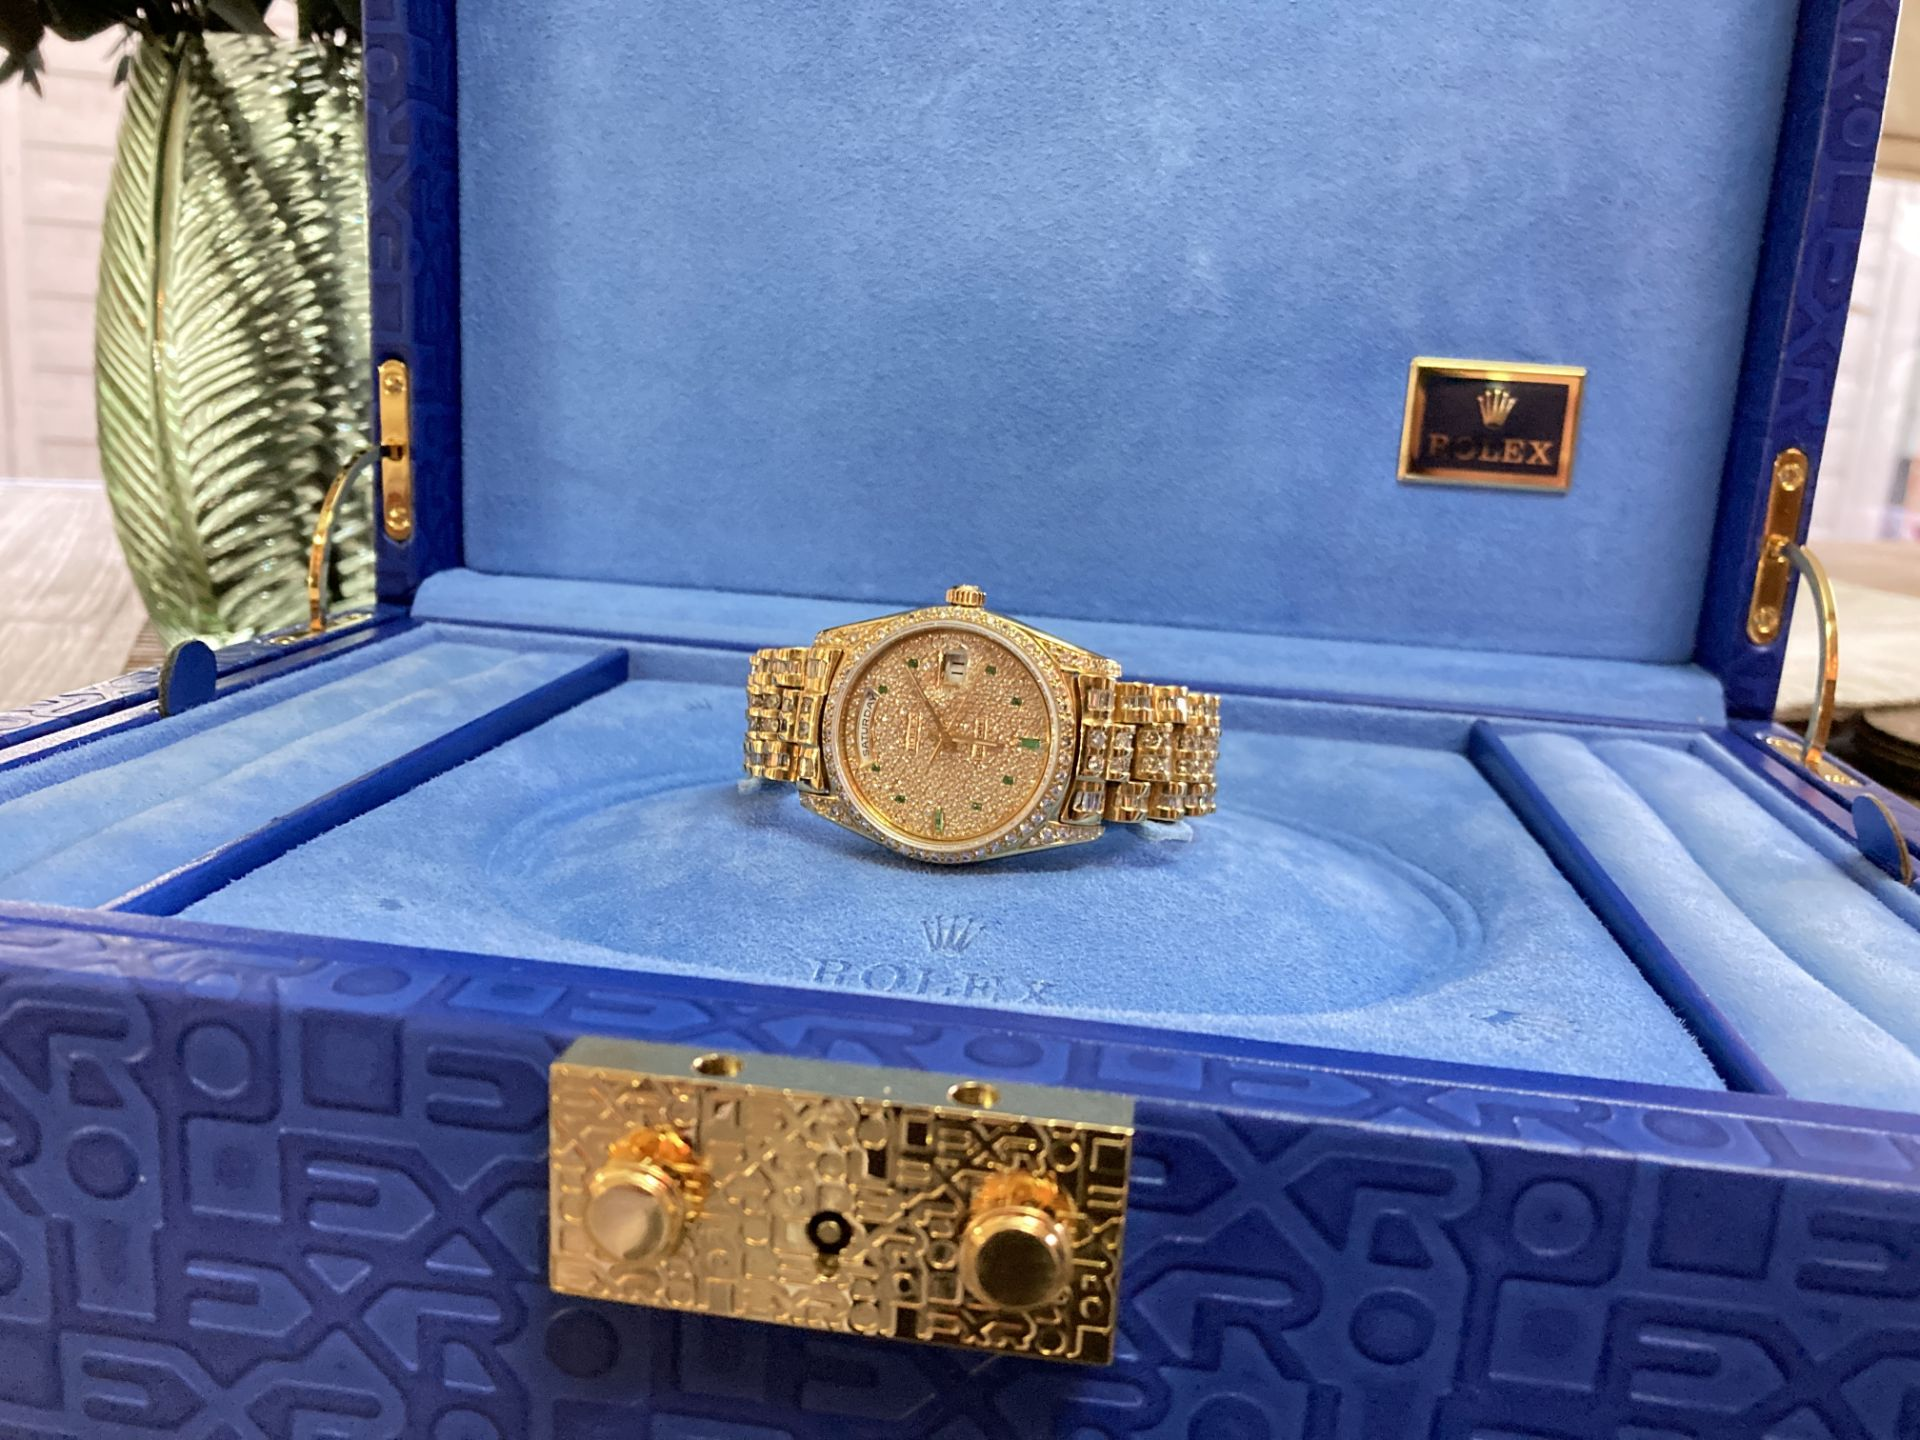 GENTS 36mm ROLEX DAYDATE YELLOW GOLD DIAMOND WATCH - Image 9 of 21